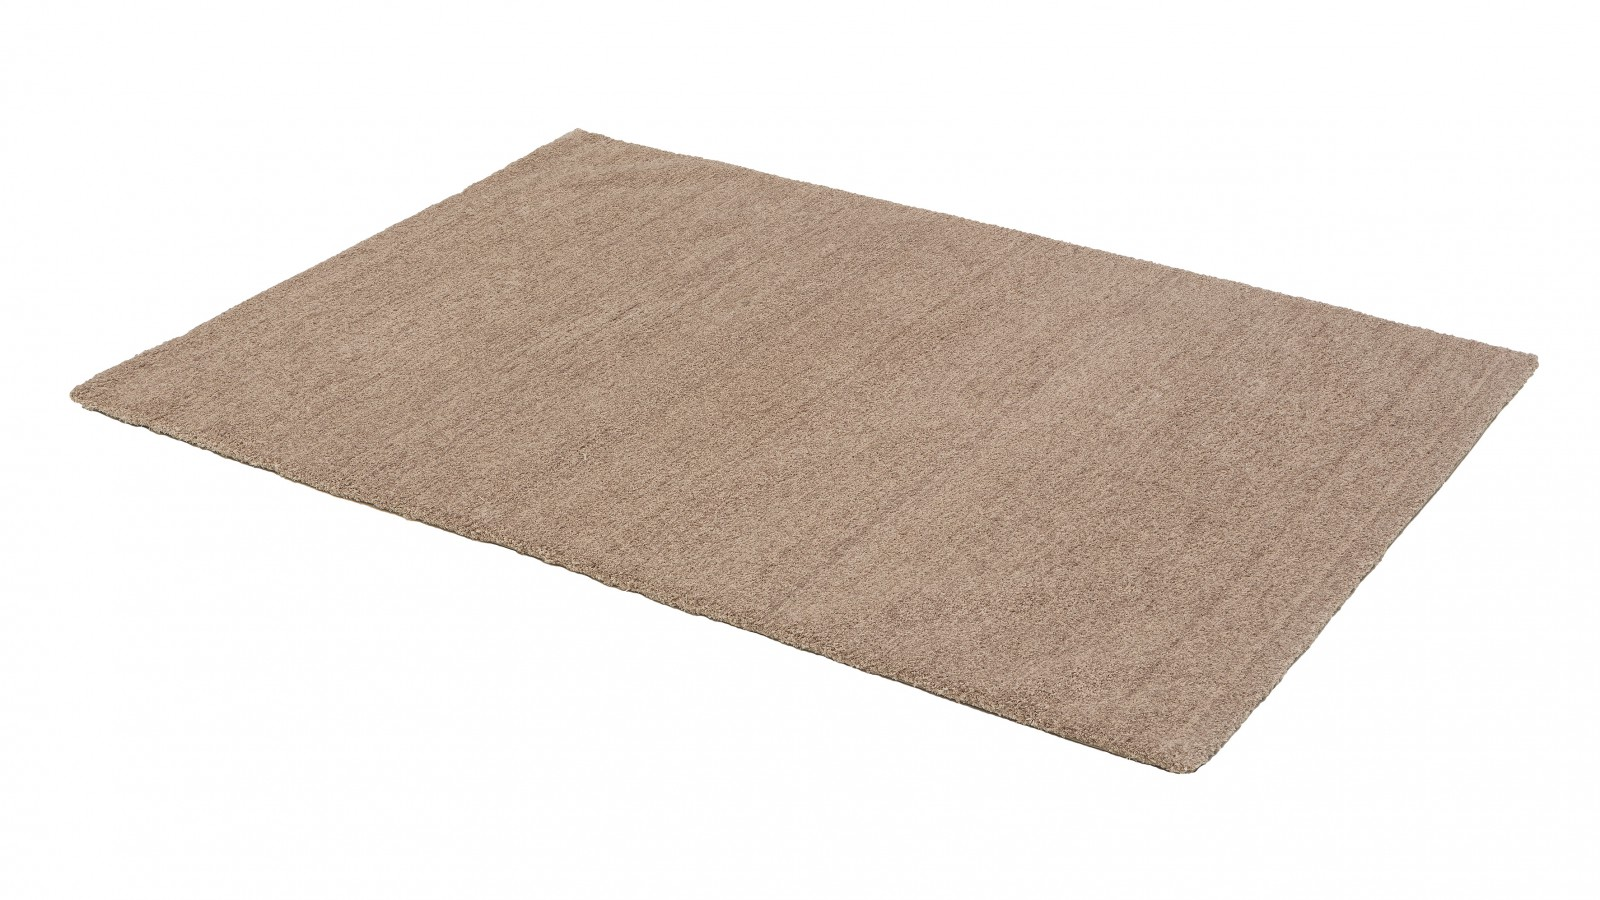 teppich hochflor shaggy flokati webteppich langflor beige. Black Bedroom Furniture Sets. Home Design Ideas